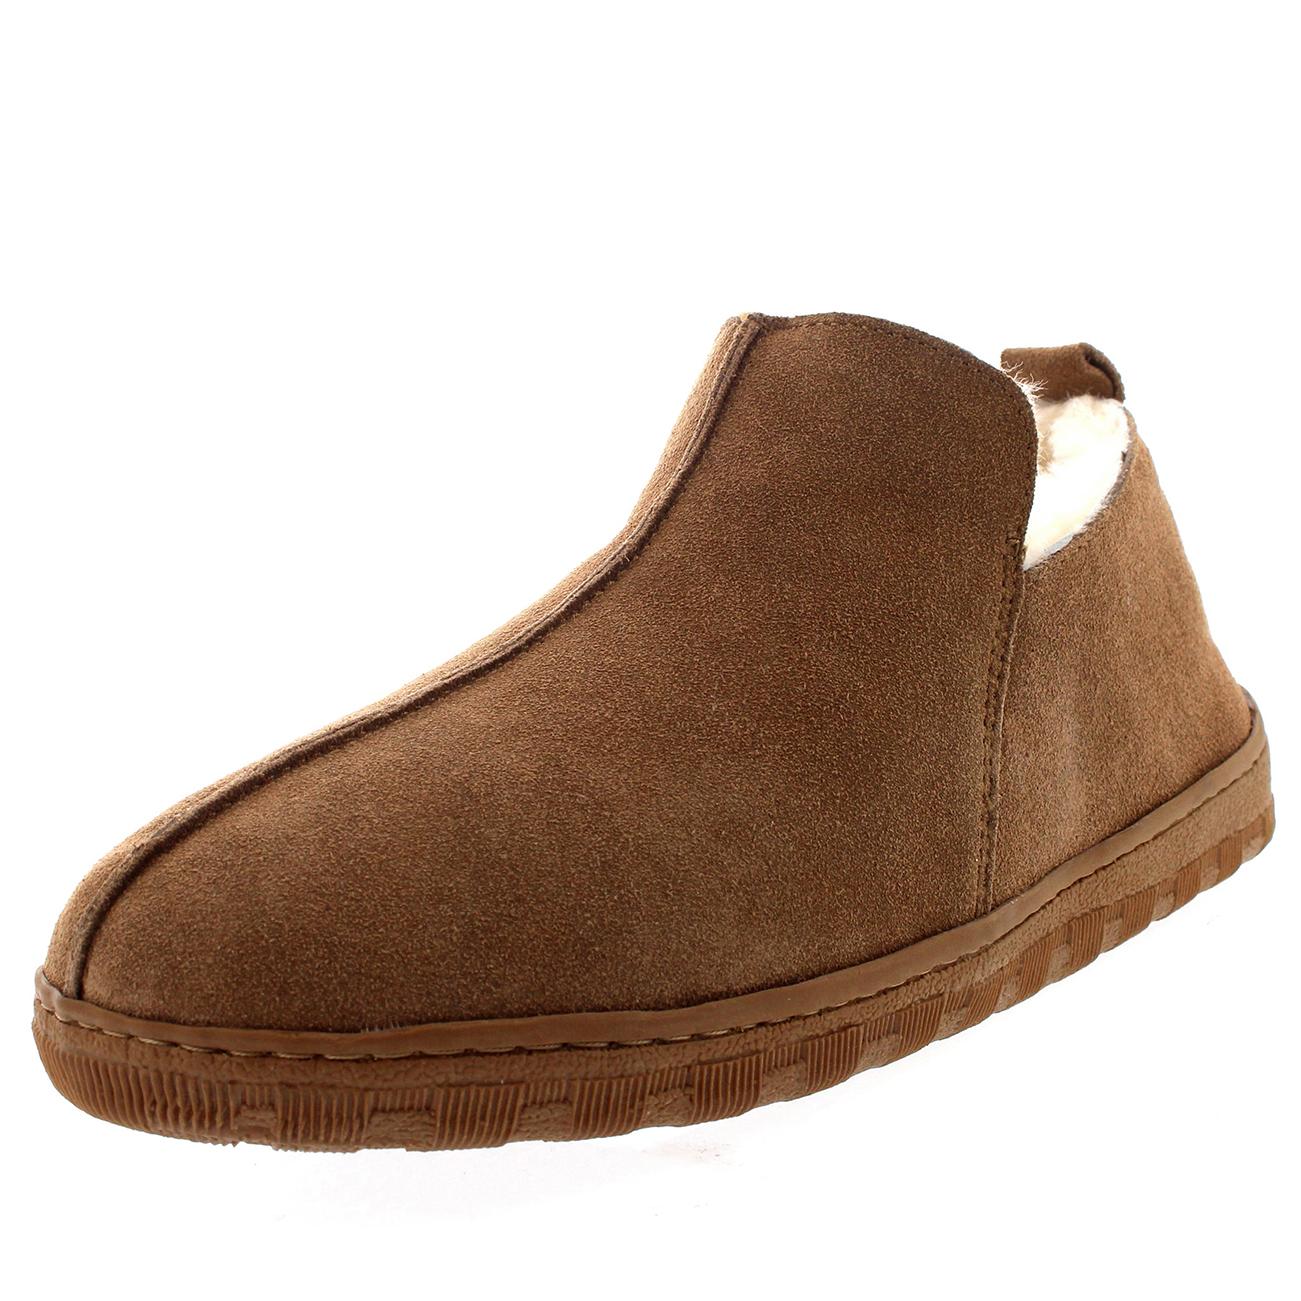 mens australian sheepskin genuine fur lined boot rubber